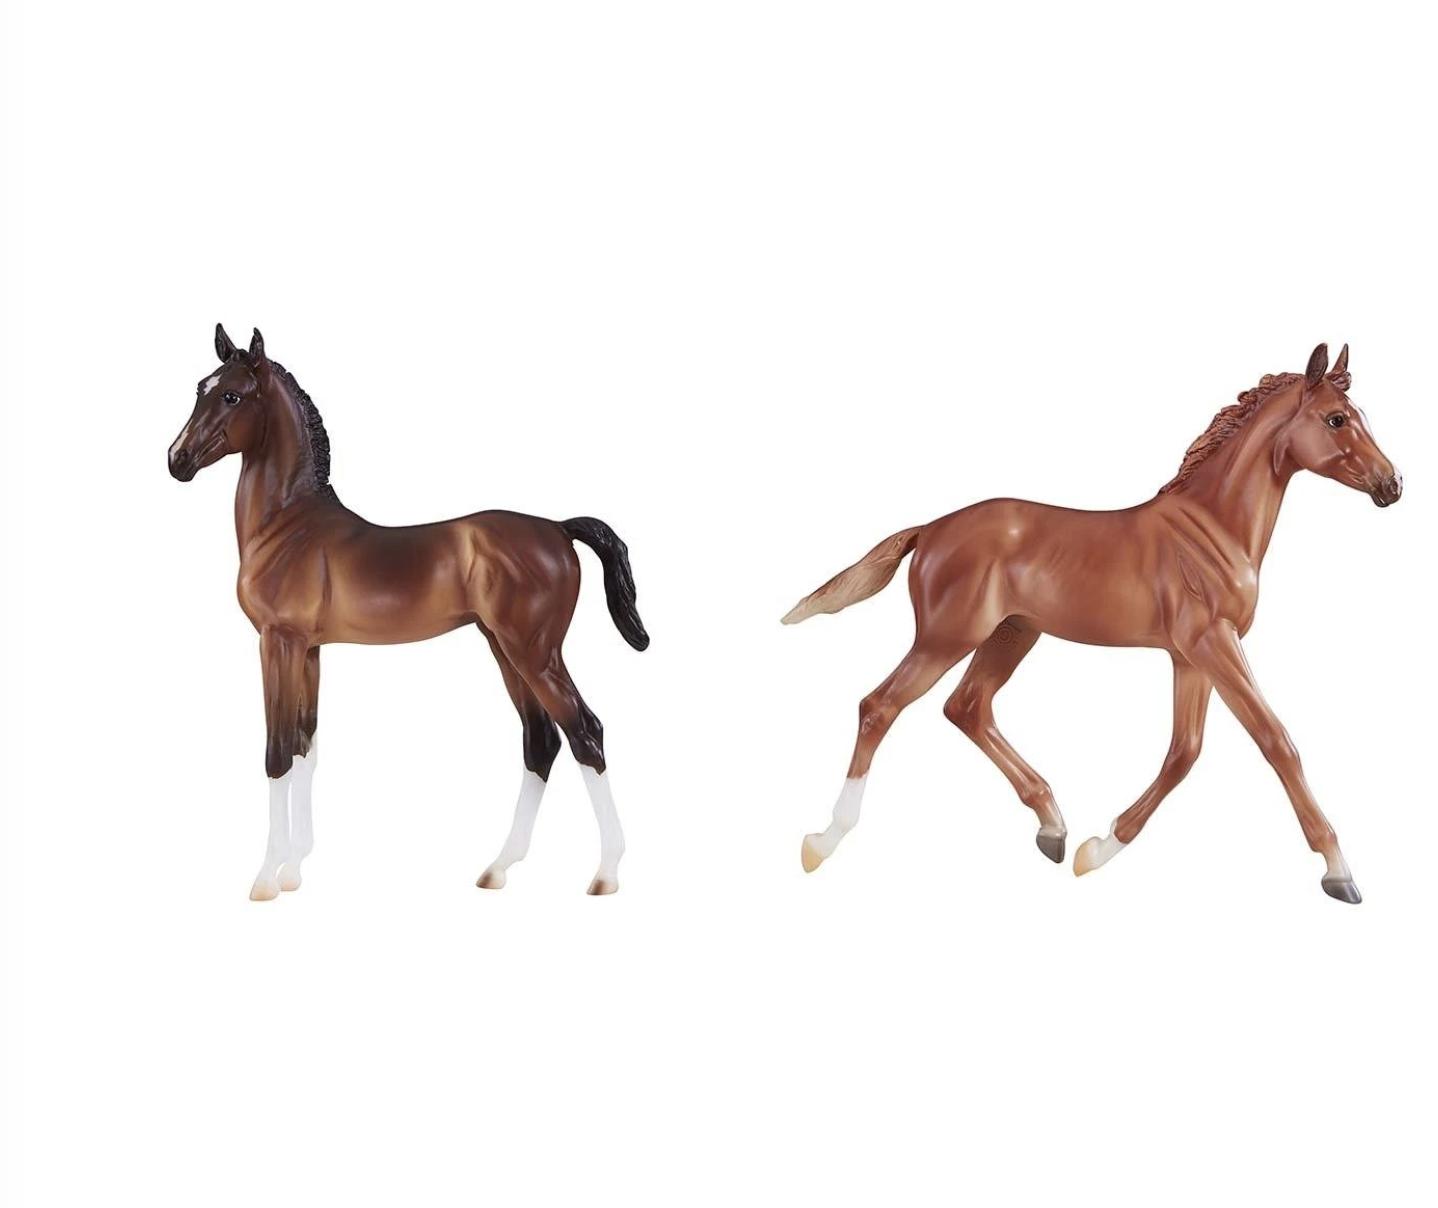 Breyer Horse Thoroughbred And Hackney Foals Sporthorse Saddlery